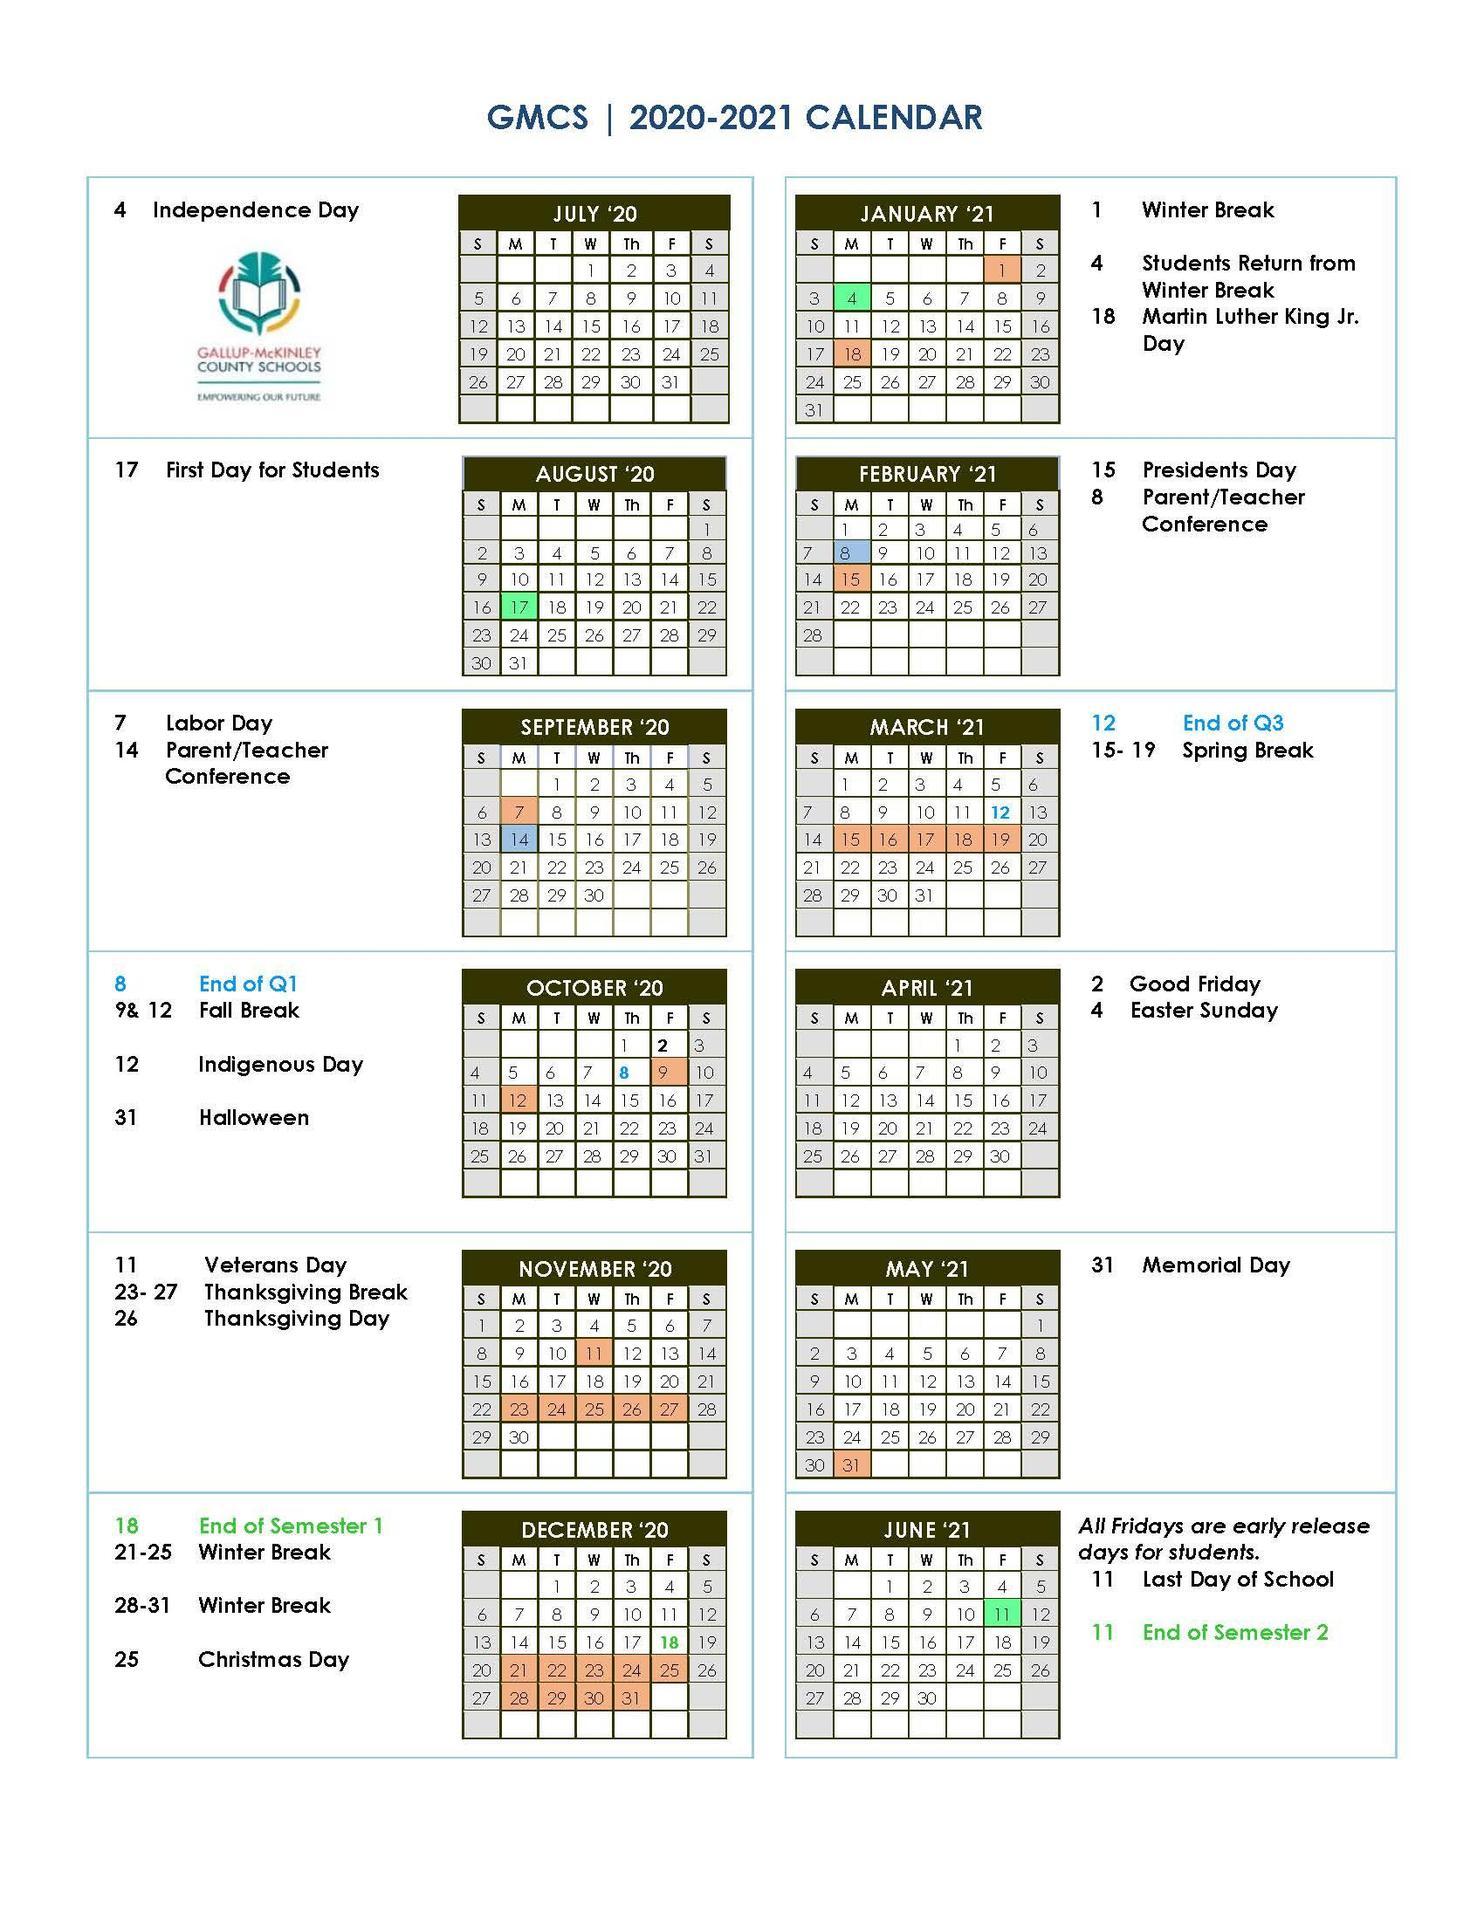 District School Year Calendar/Graduation Dates – Parents